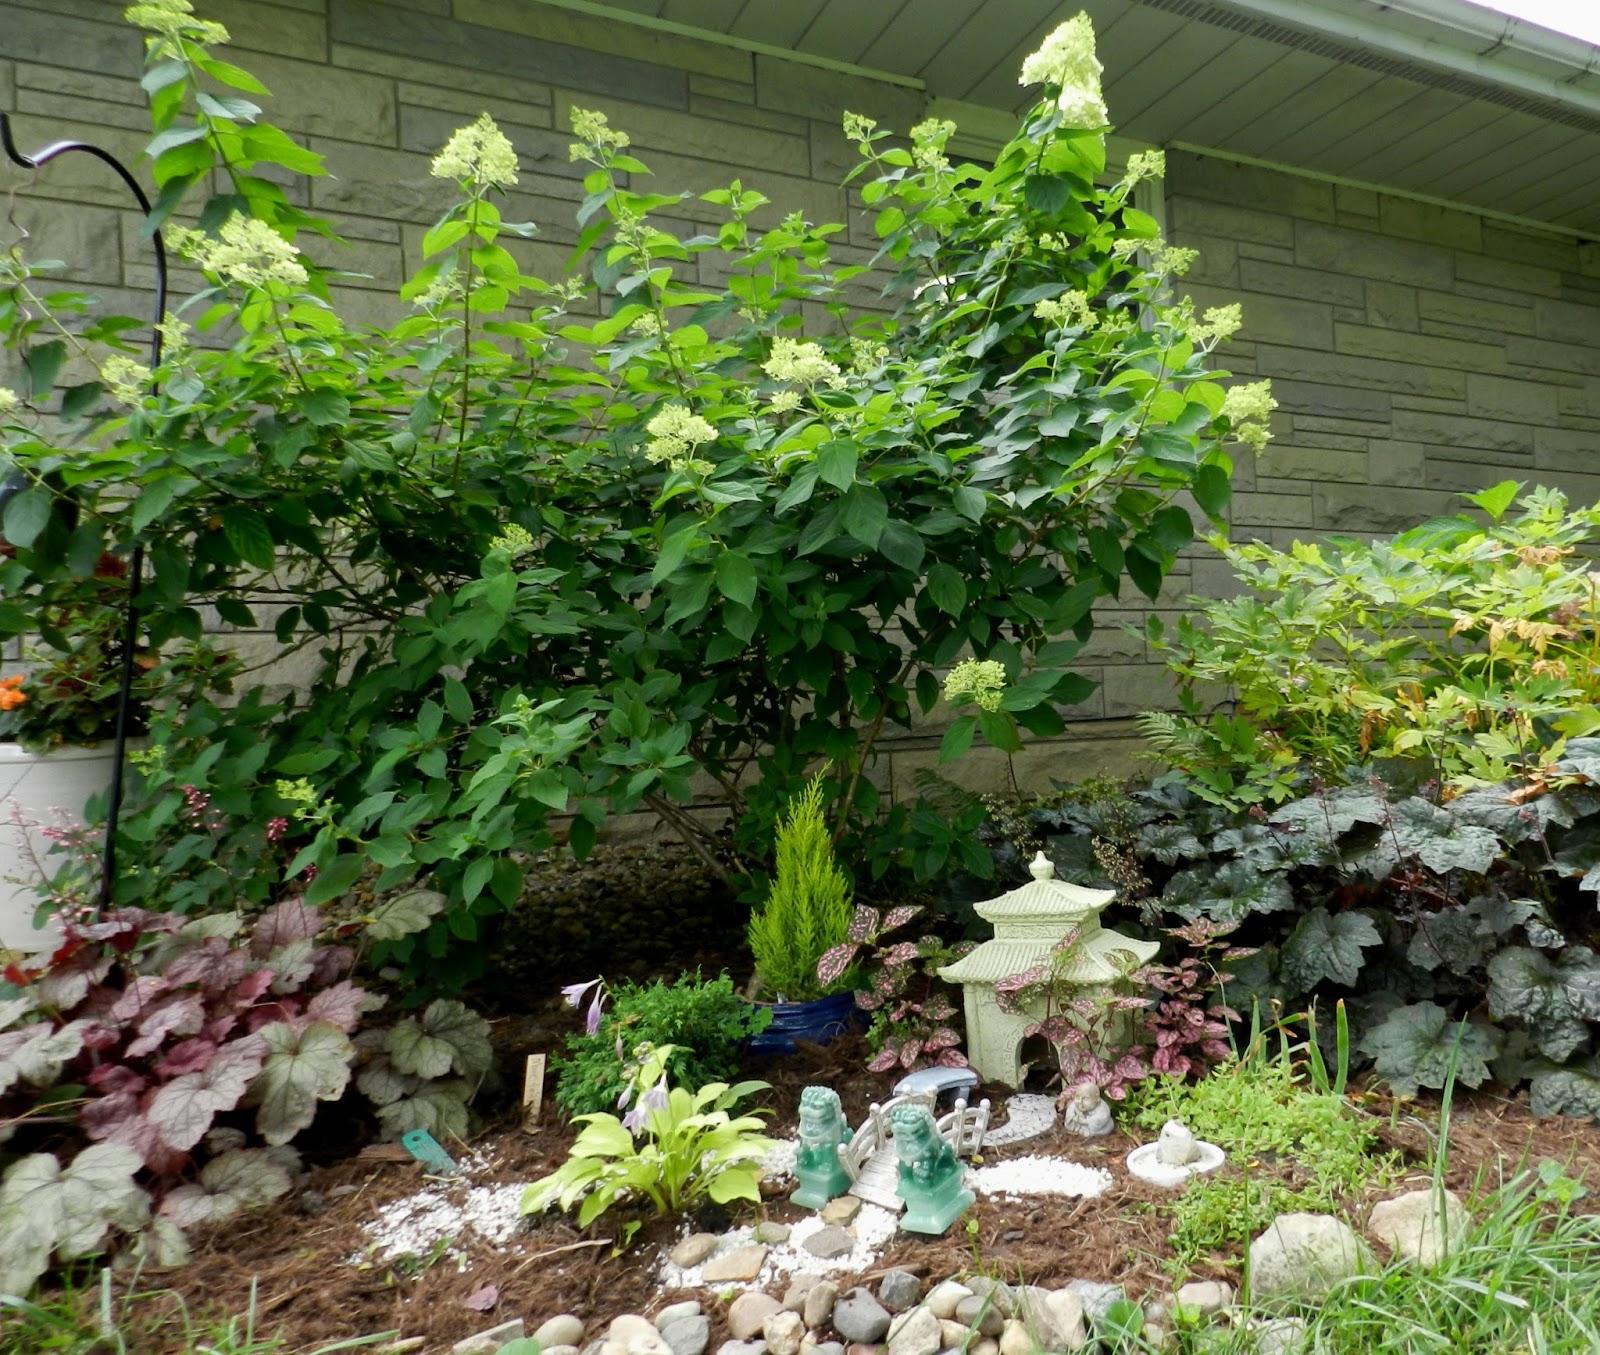 Japanese Garden Indoor: Prairie Rose's Garden: Welcome To My Japanese Garden